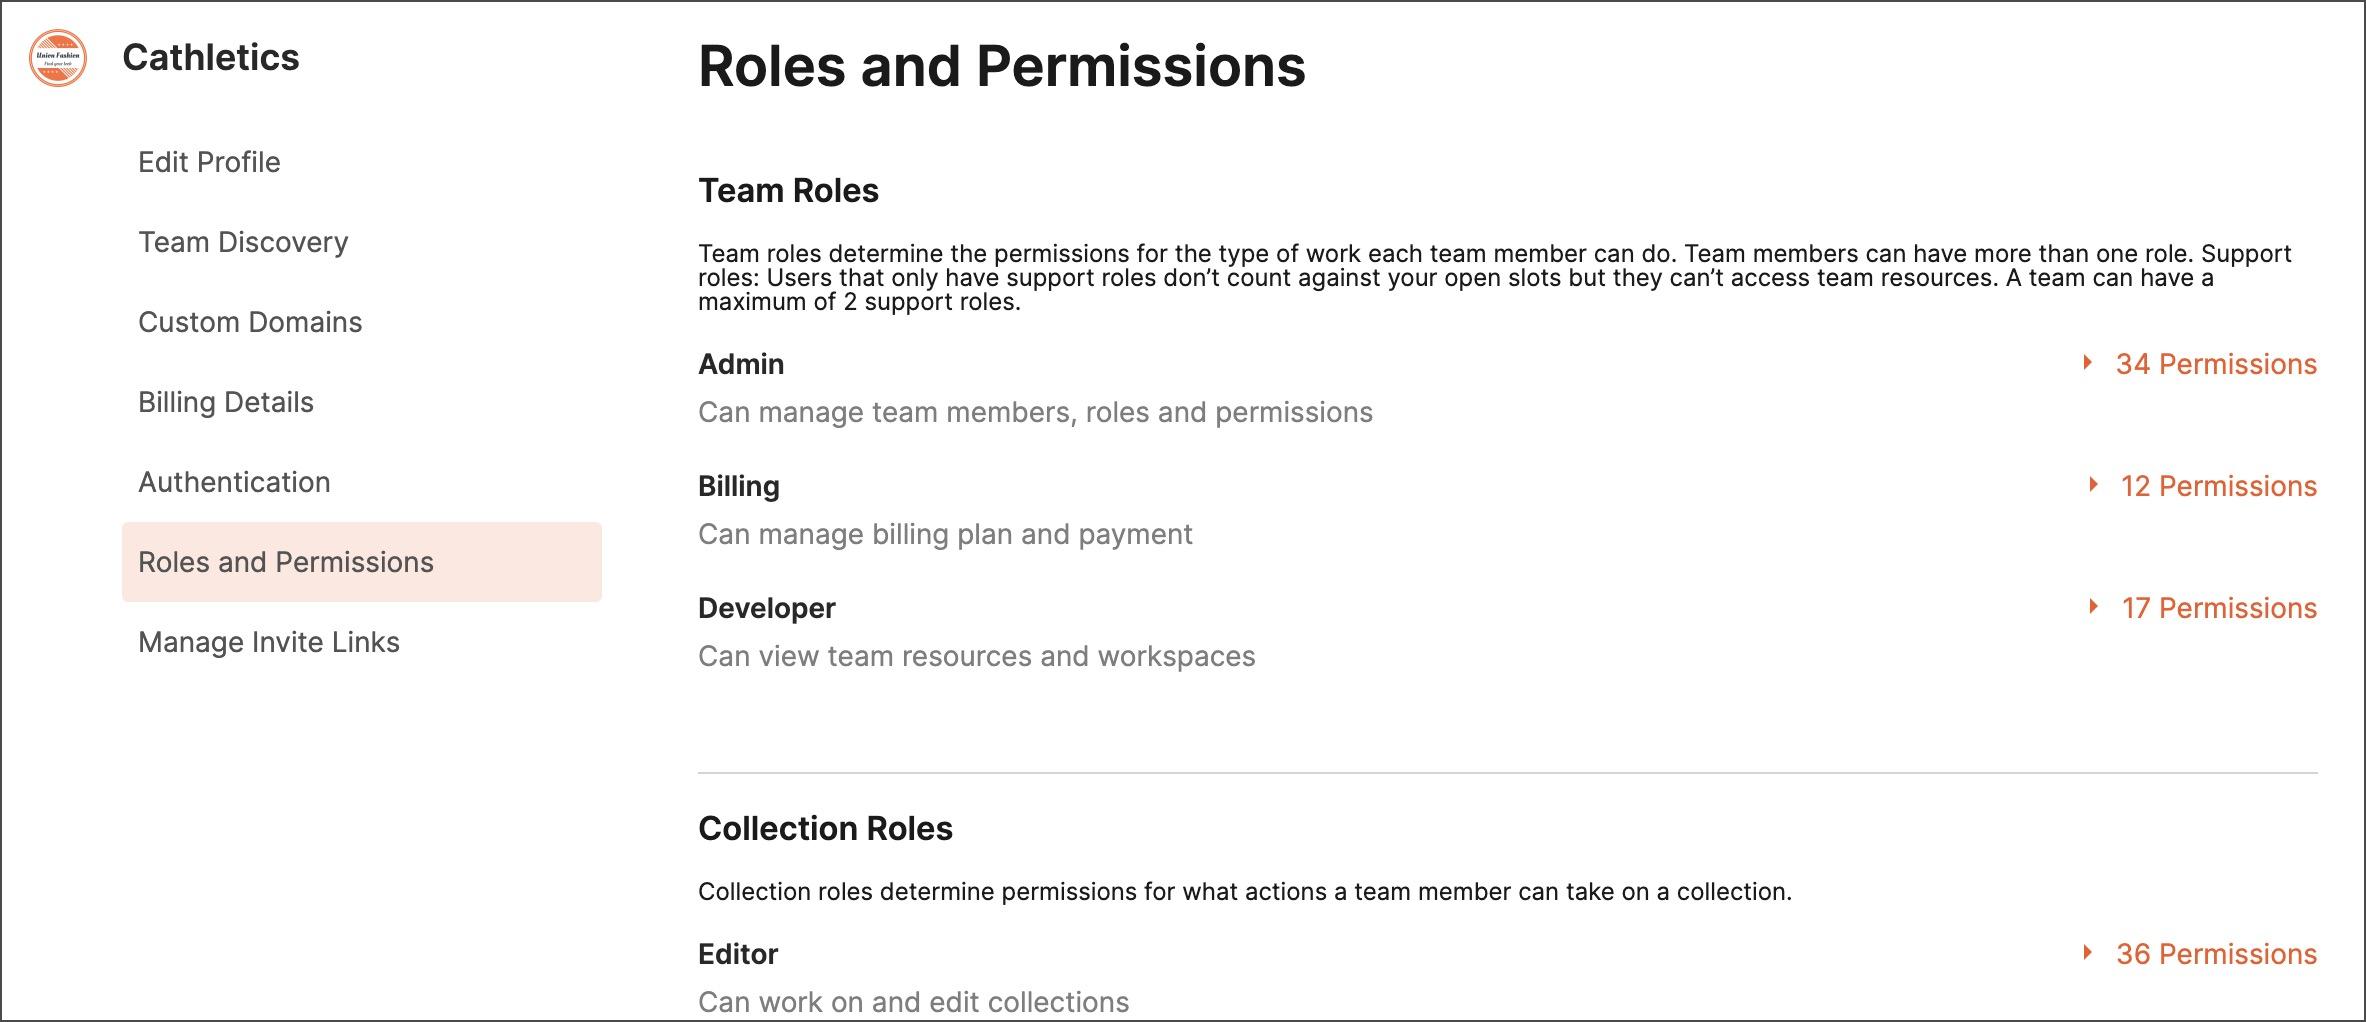 Roles and permissions descriptions